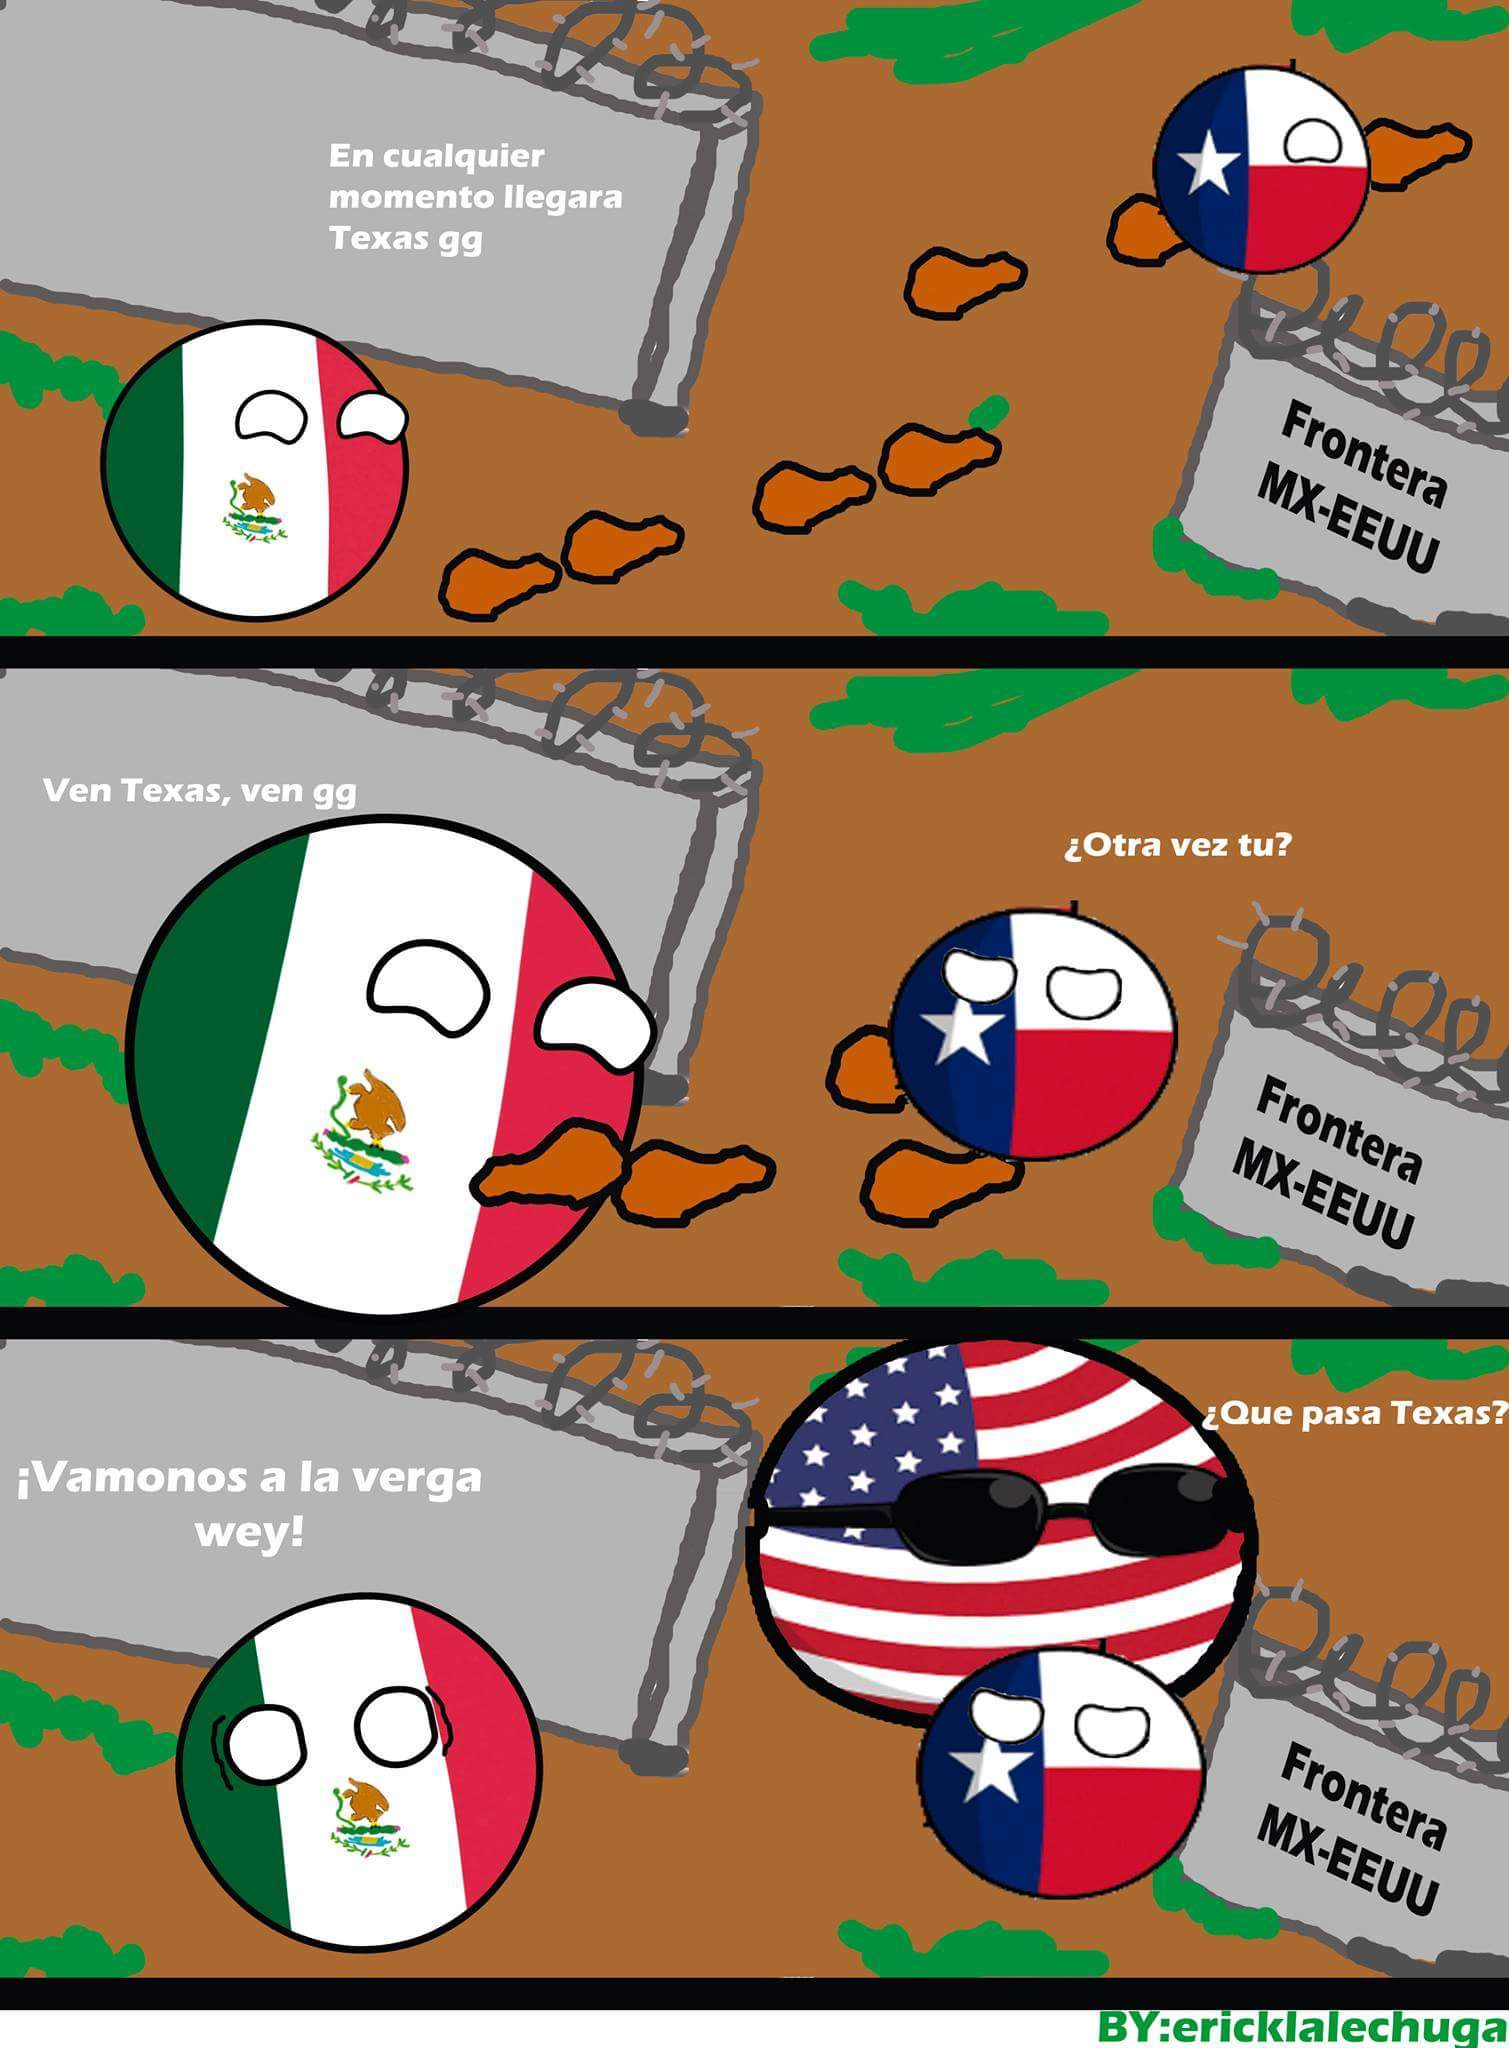 Algún día Texas volverá, yo lo sé :( - meme